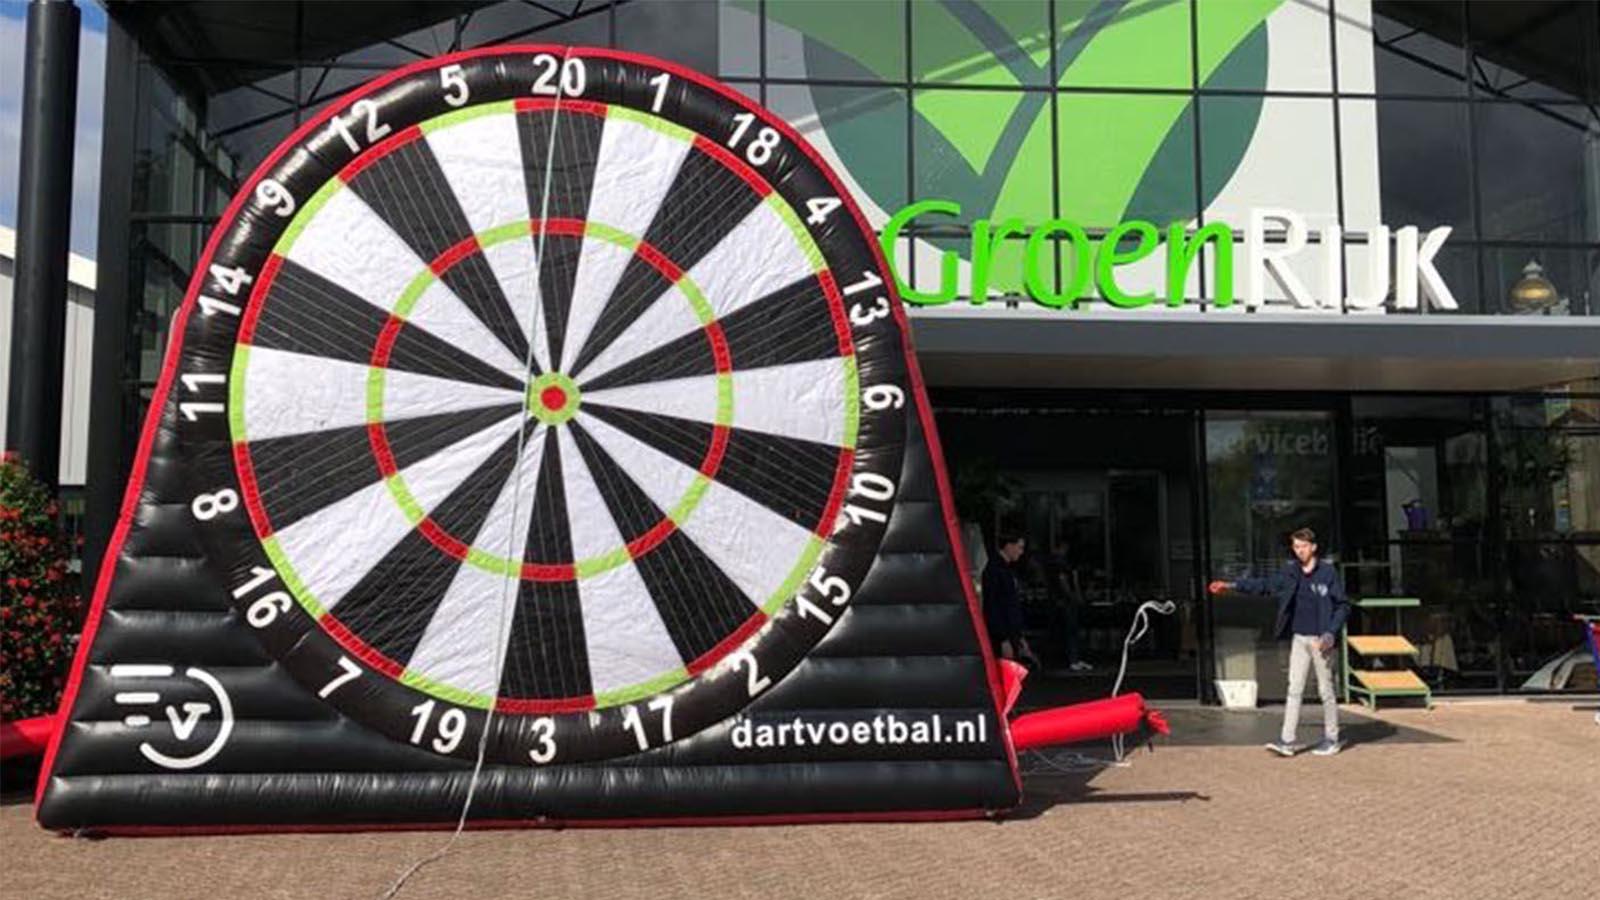 dart voetbal